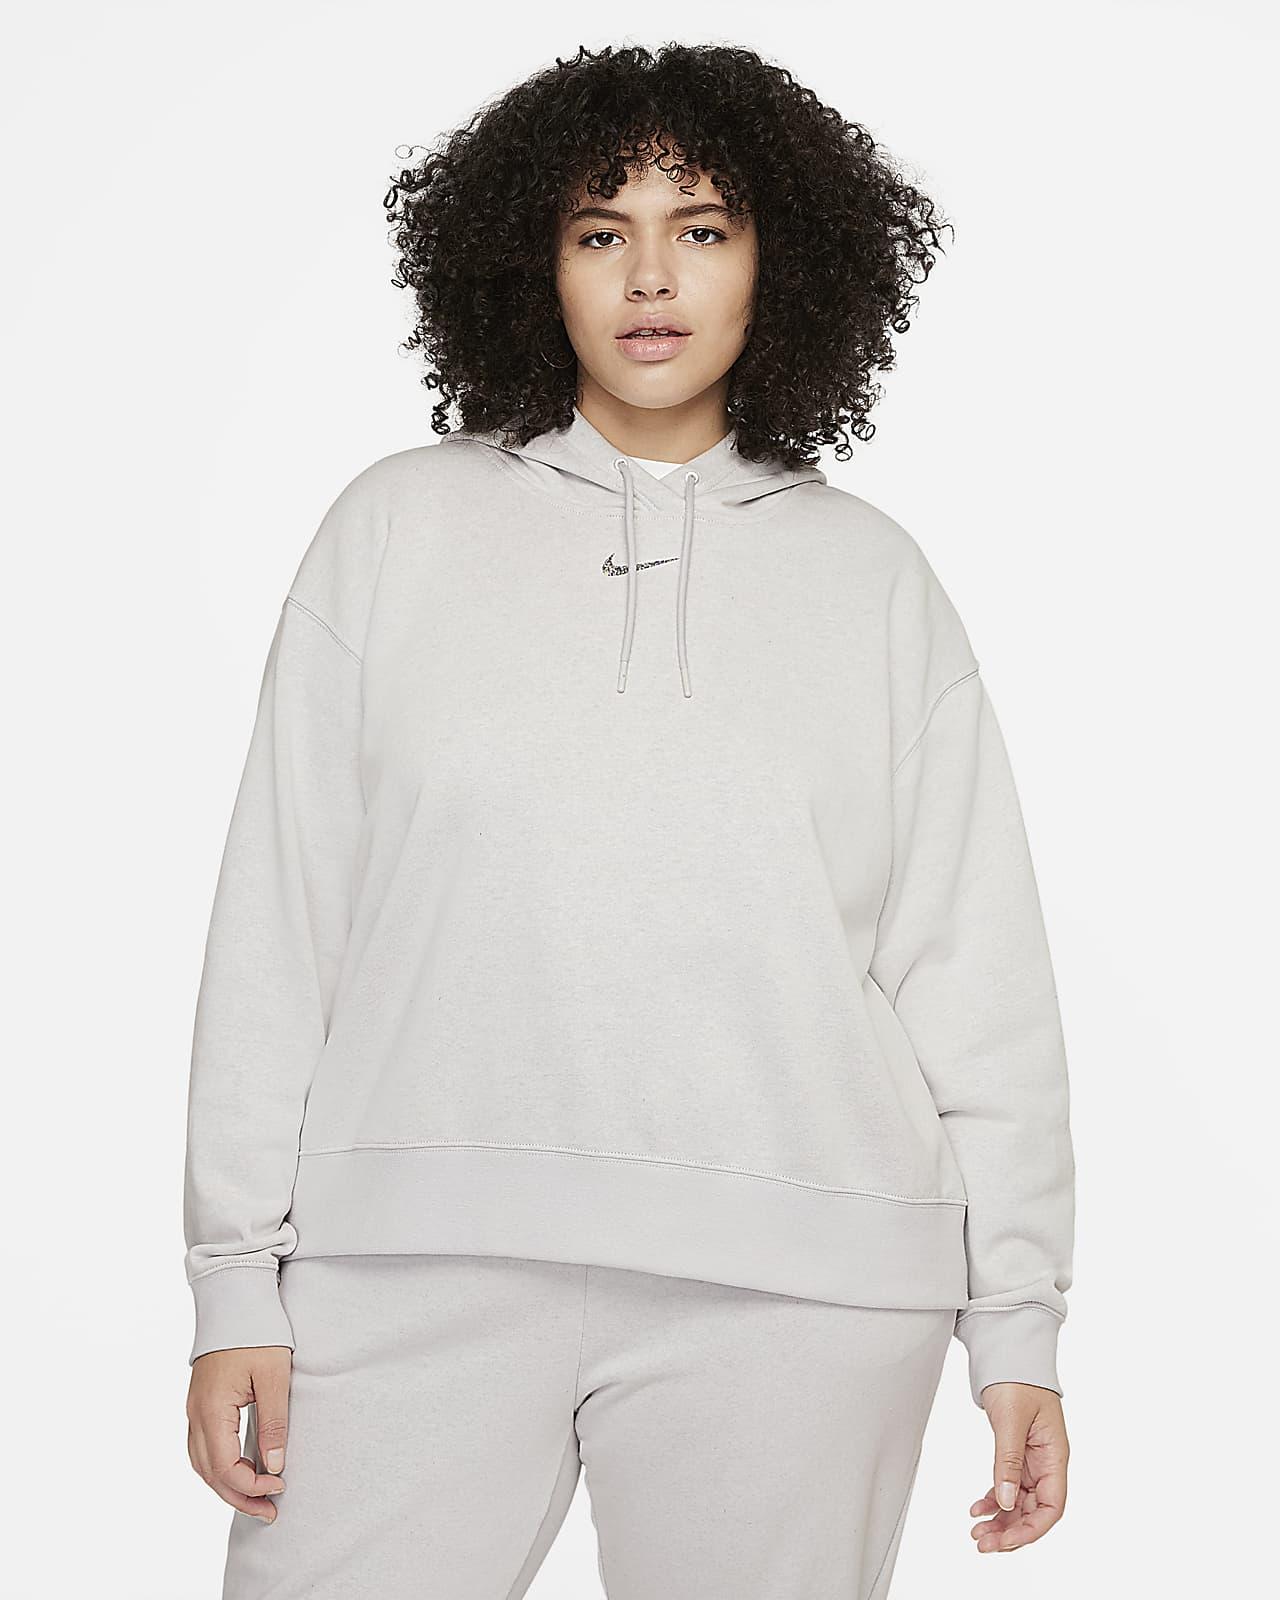 Sudadera con gorro de tejido Fleece sencillo para mujer talla grande Nike Sportswear Collection Essential